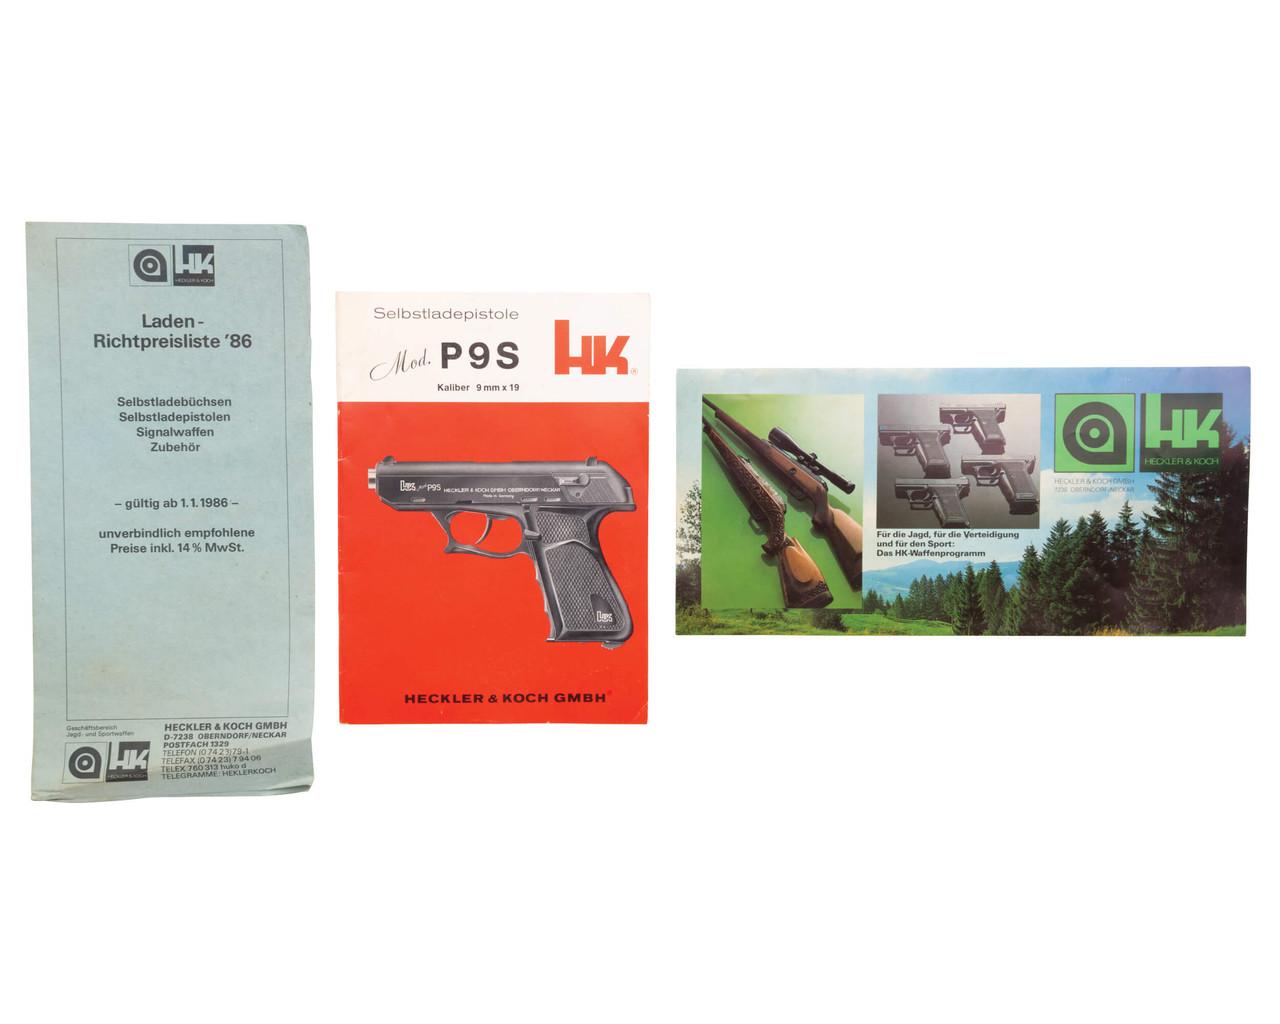 H&K P9S Sport Group III - sn 137xxx